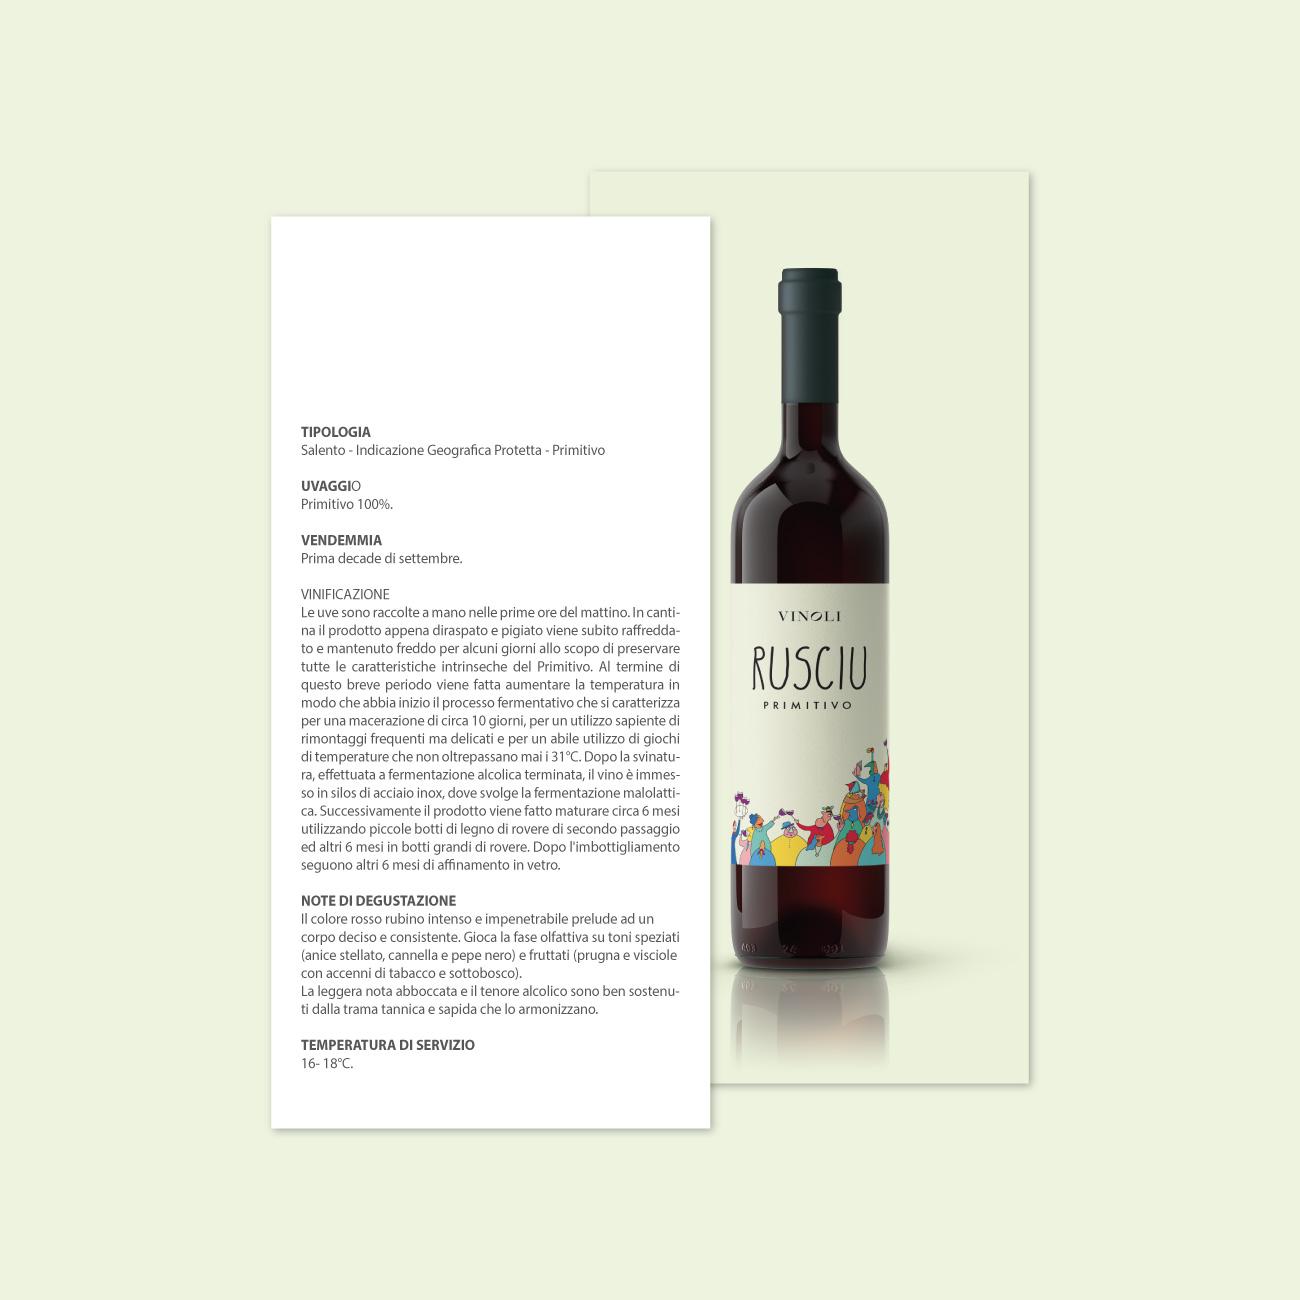 https://www.orlandinifrancesco.com/wp/wp-content/uploads/2019/07/Vinoli-Scheda-Tecnica-Rusciu-Orlandini-Francesco-2.jpg